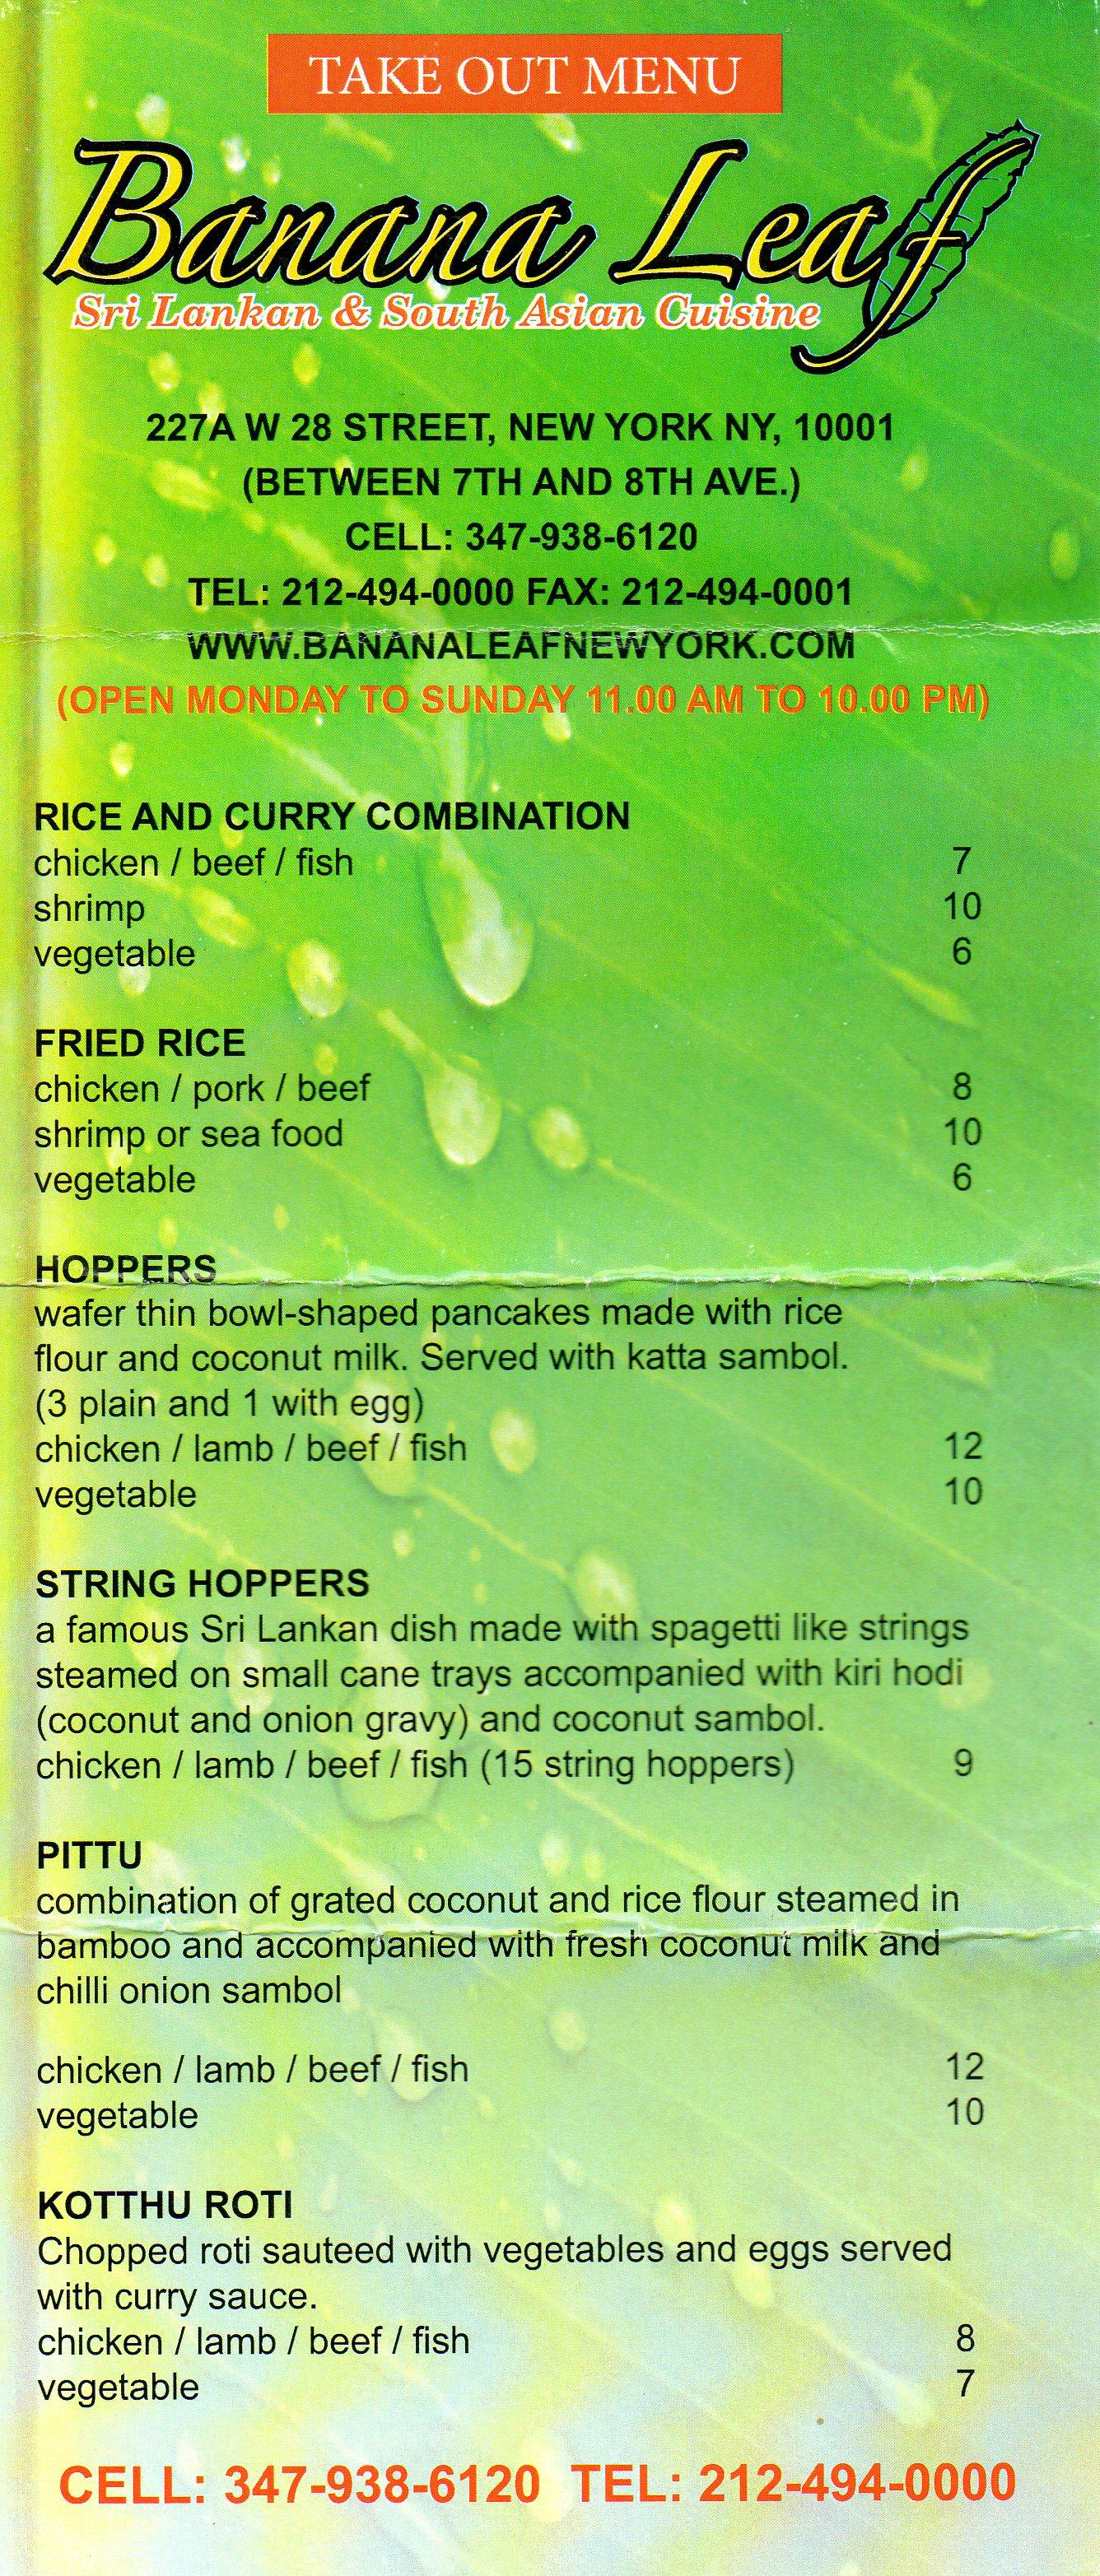 Just Like Home Toy Restaurant Menu : Banana leaf a sri lankan oasis on manhattan s west side